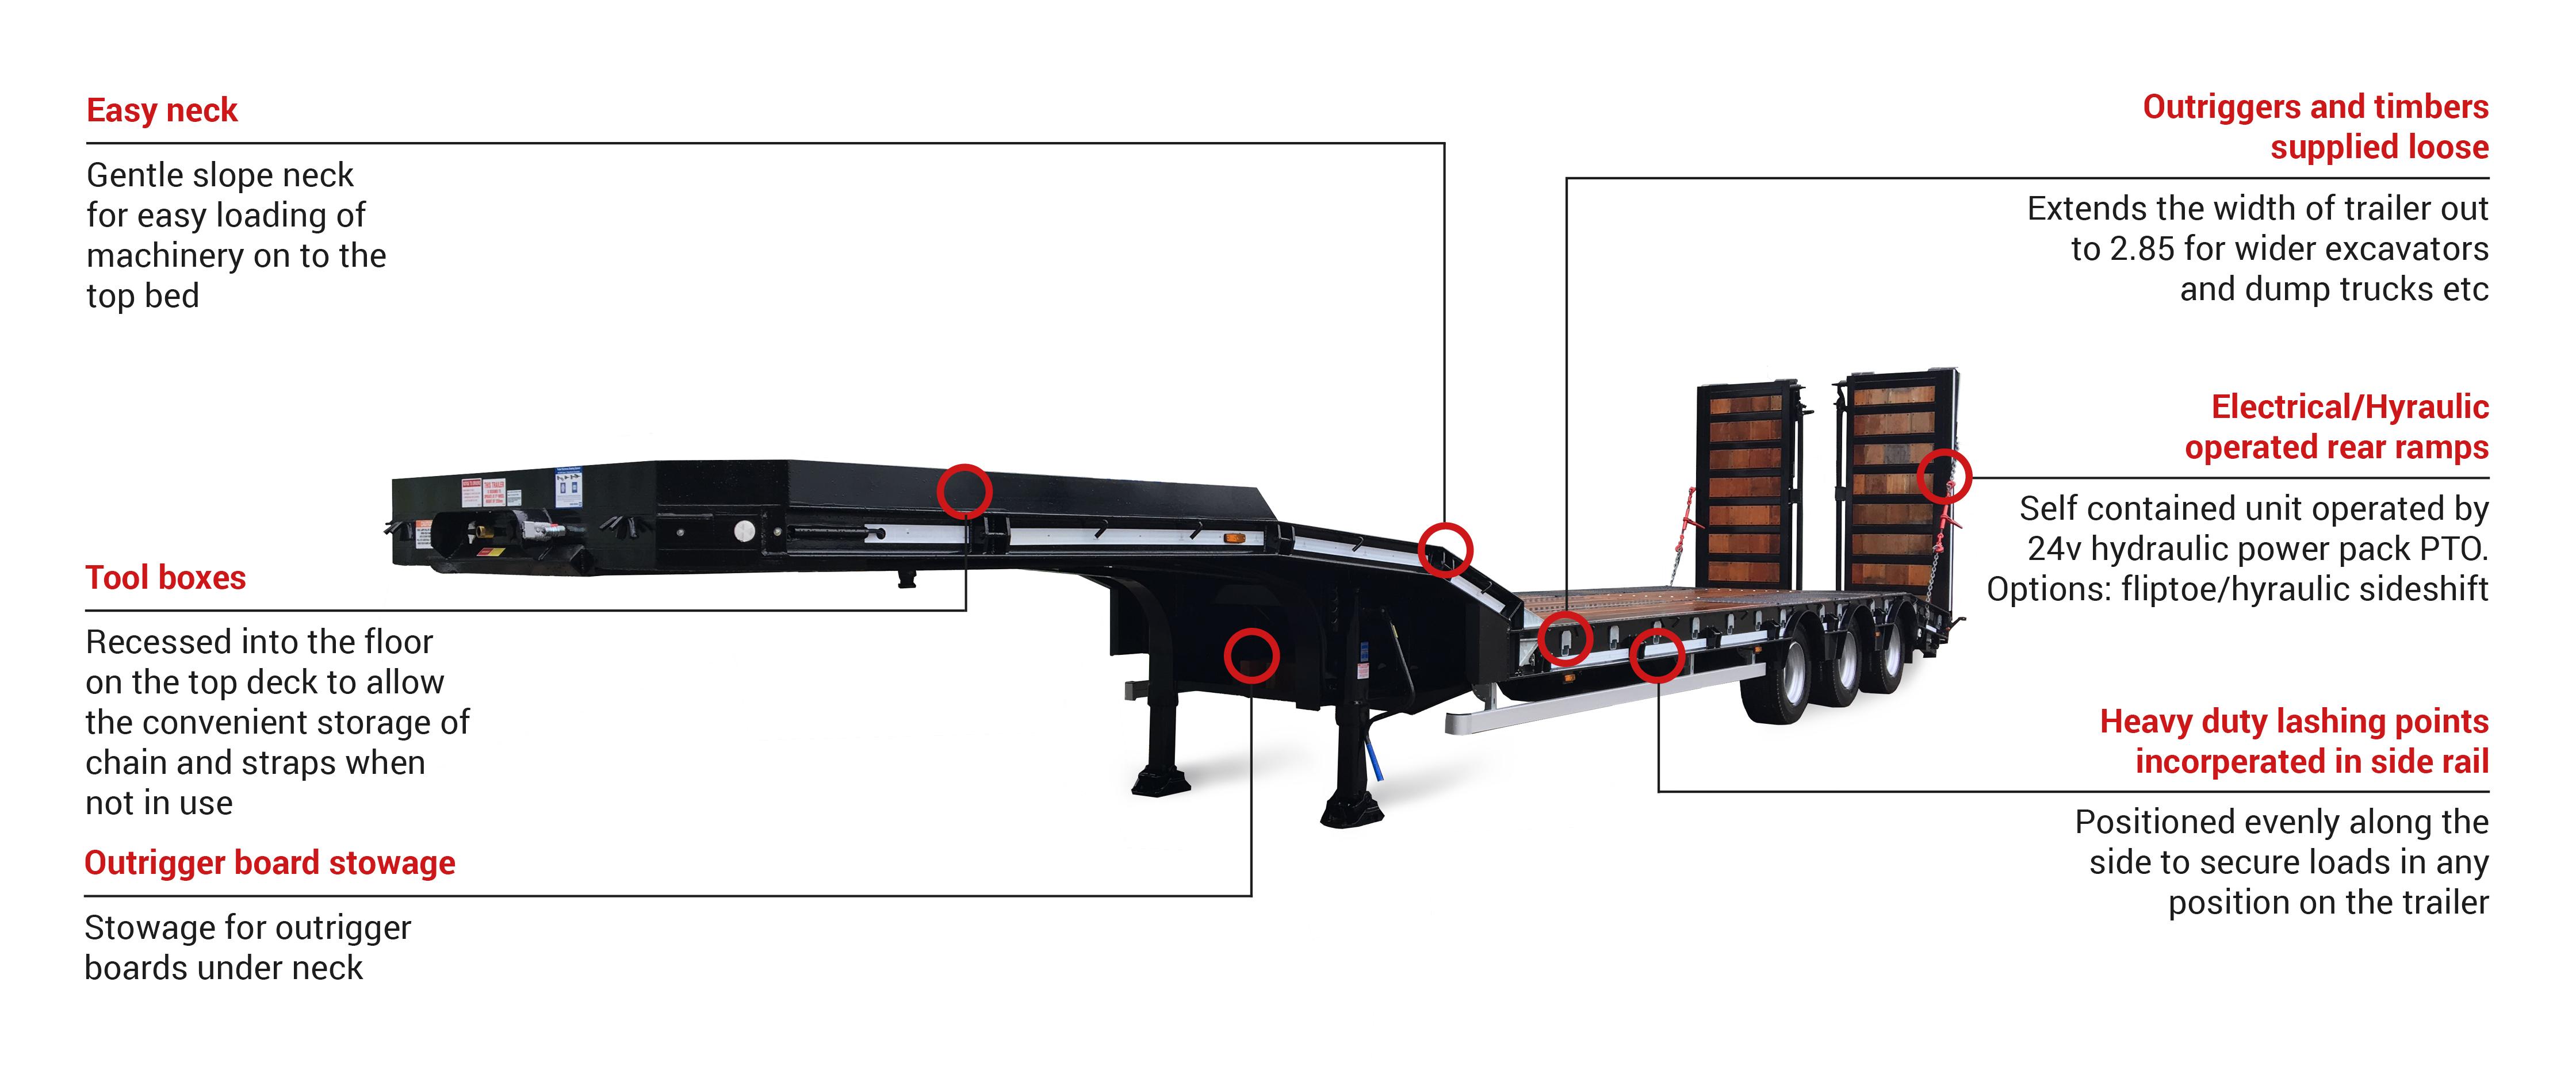 44 Tonne Easy Neck Machinery Trailer | Dennison Trailers